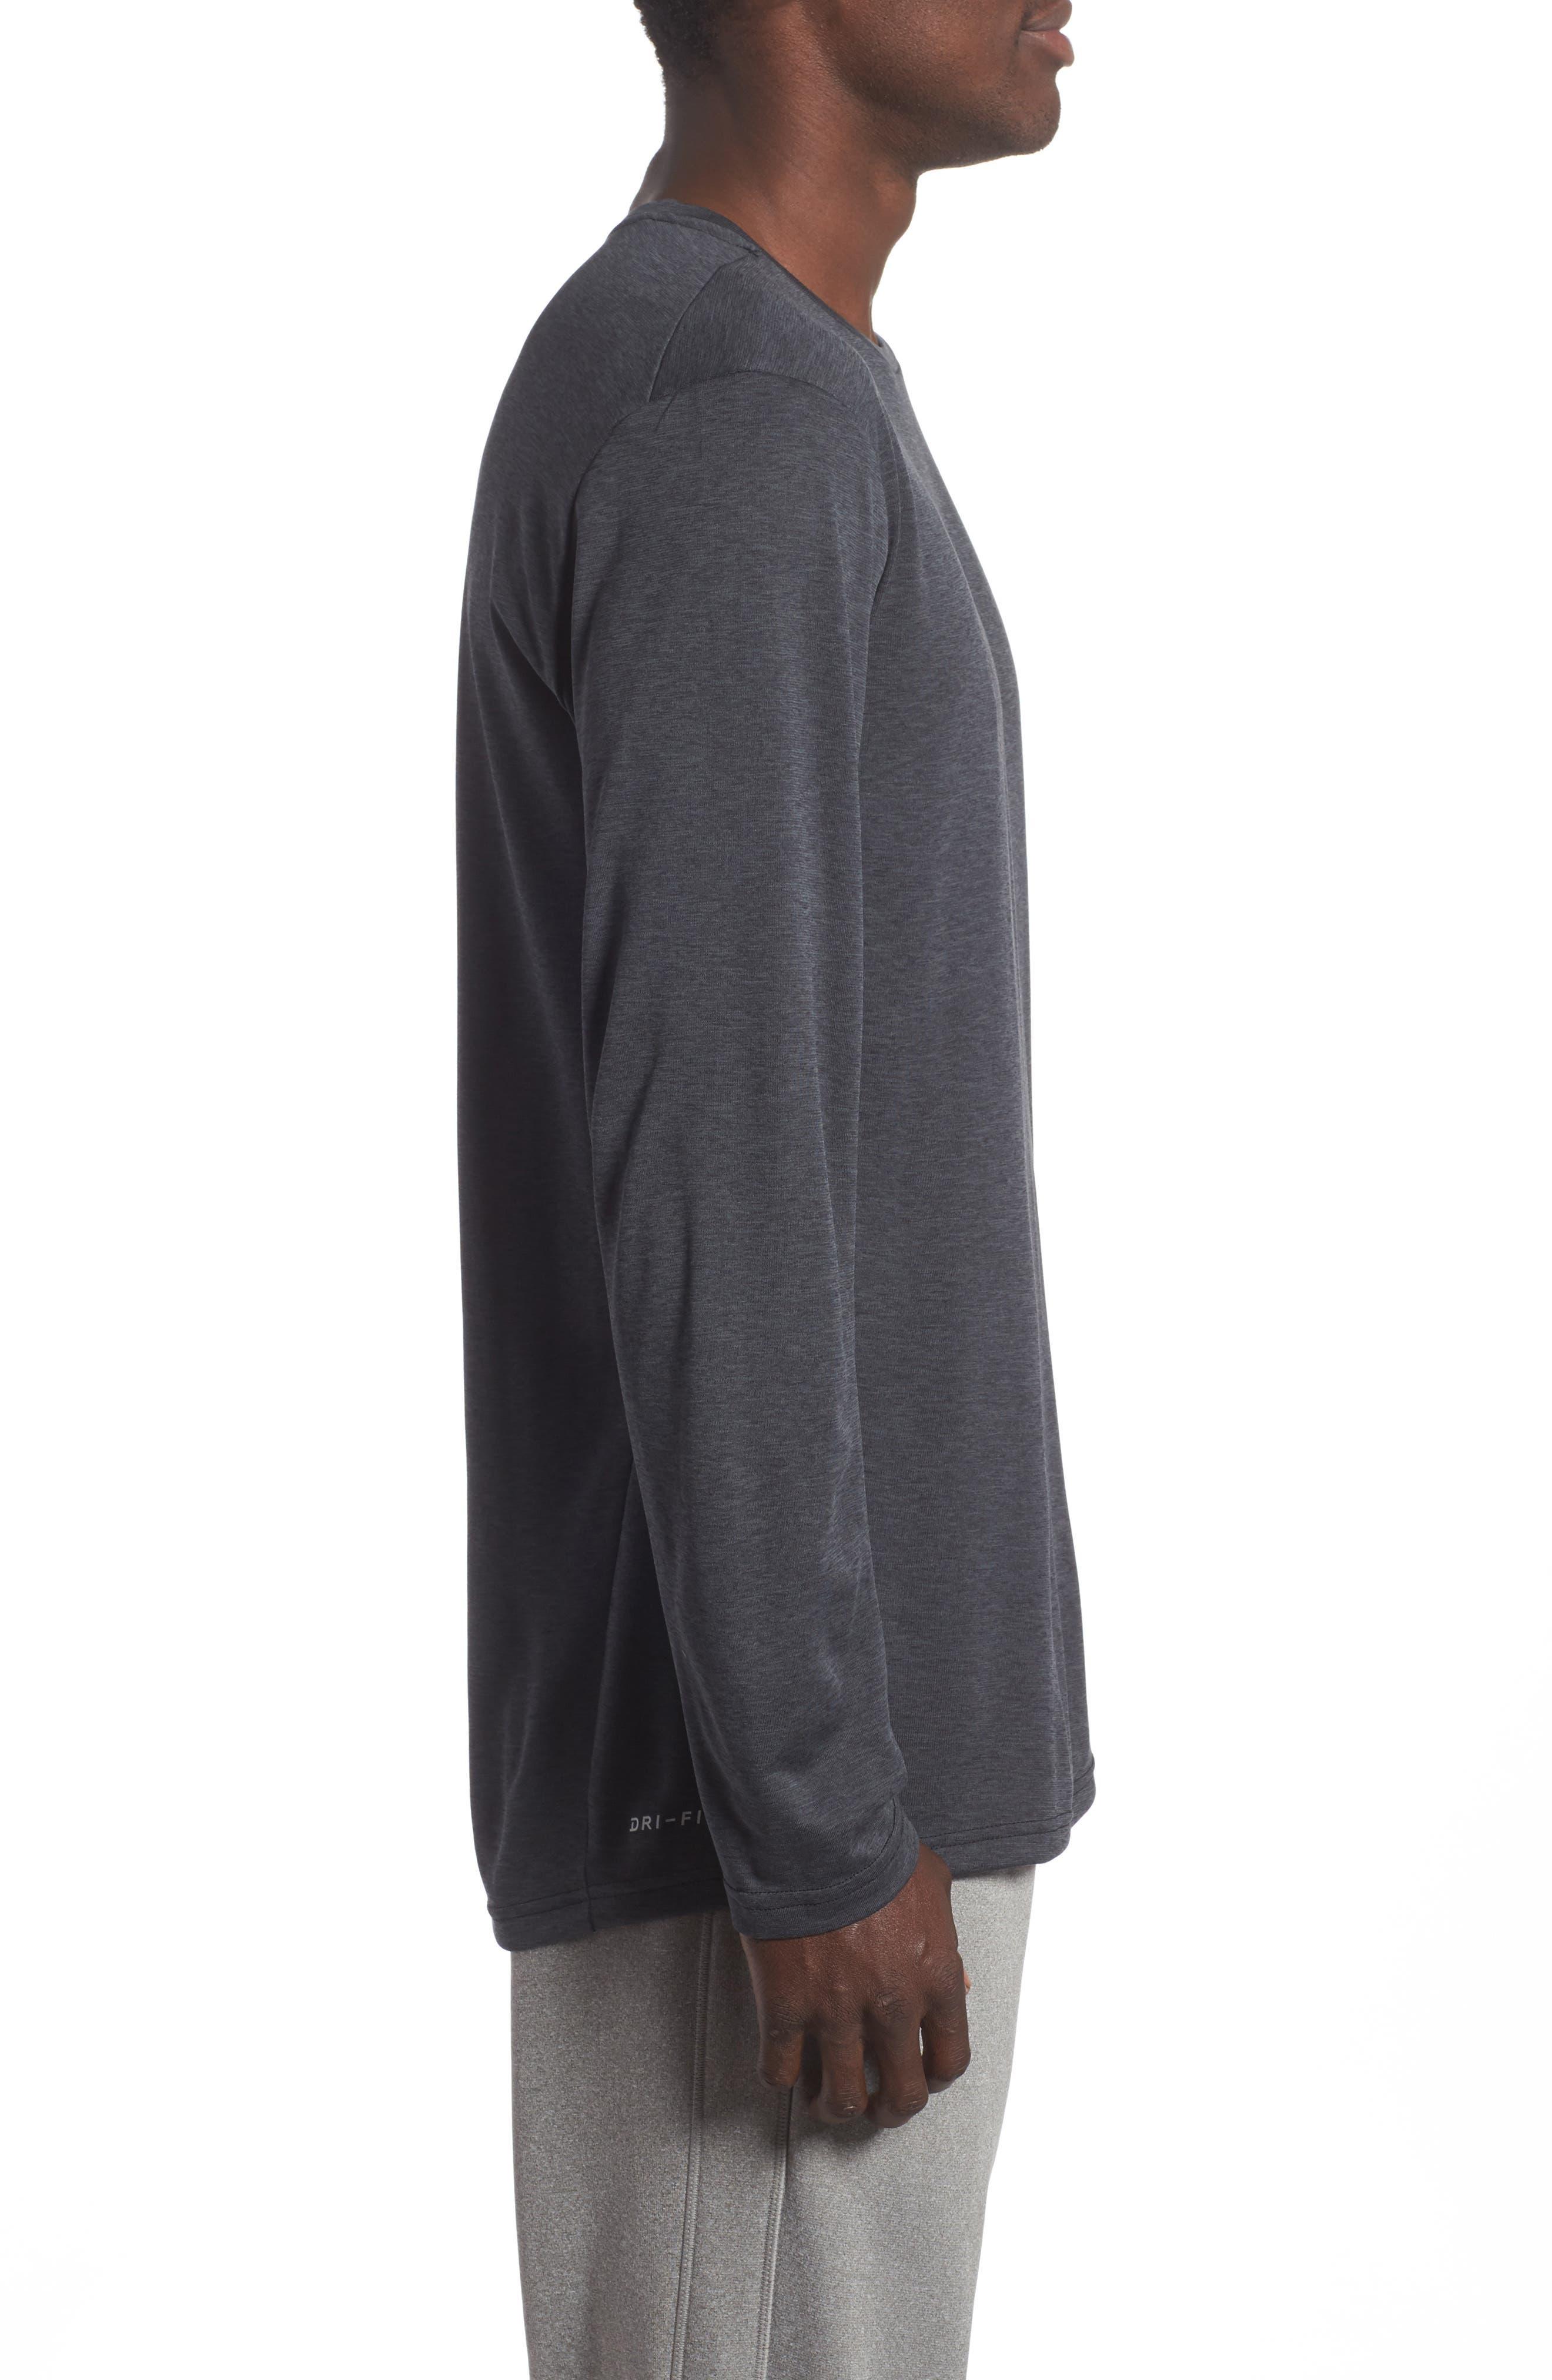 Long Sleeve Training T-Shirt,                             Alternate thumbnail 3, color,                             Black/ Anthracite/ Hematite